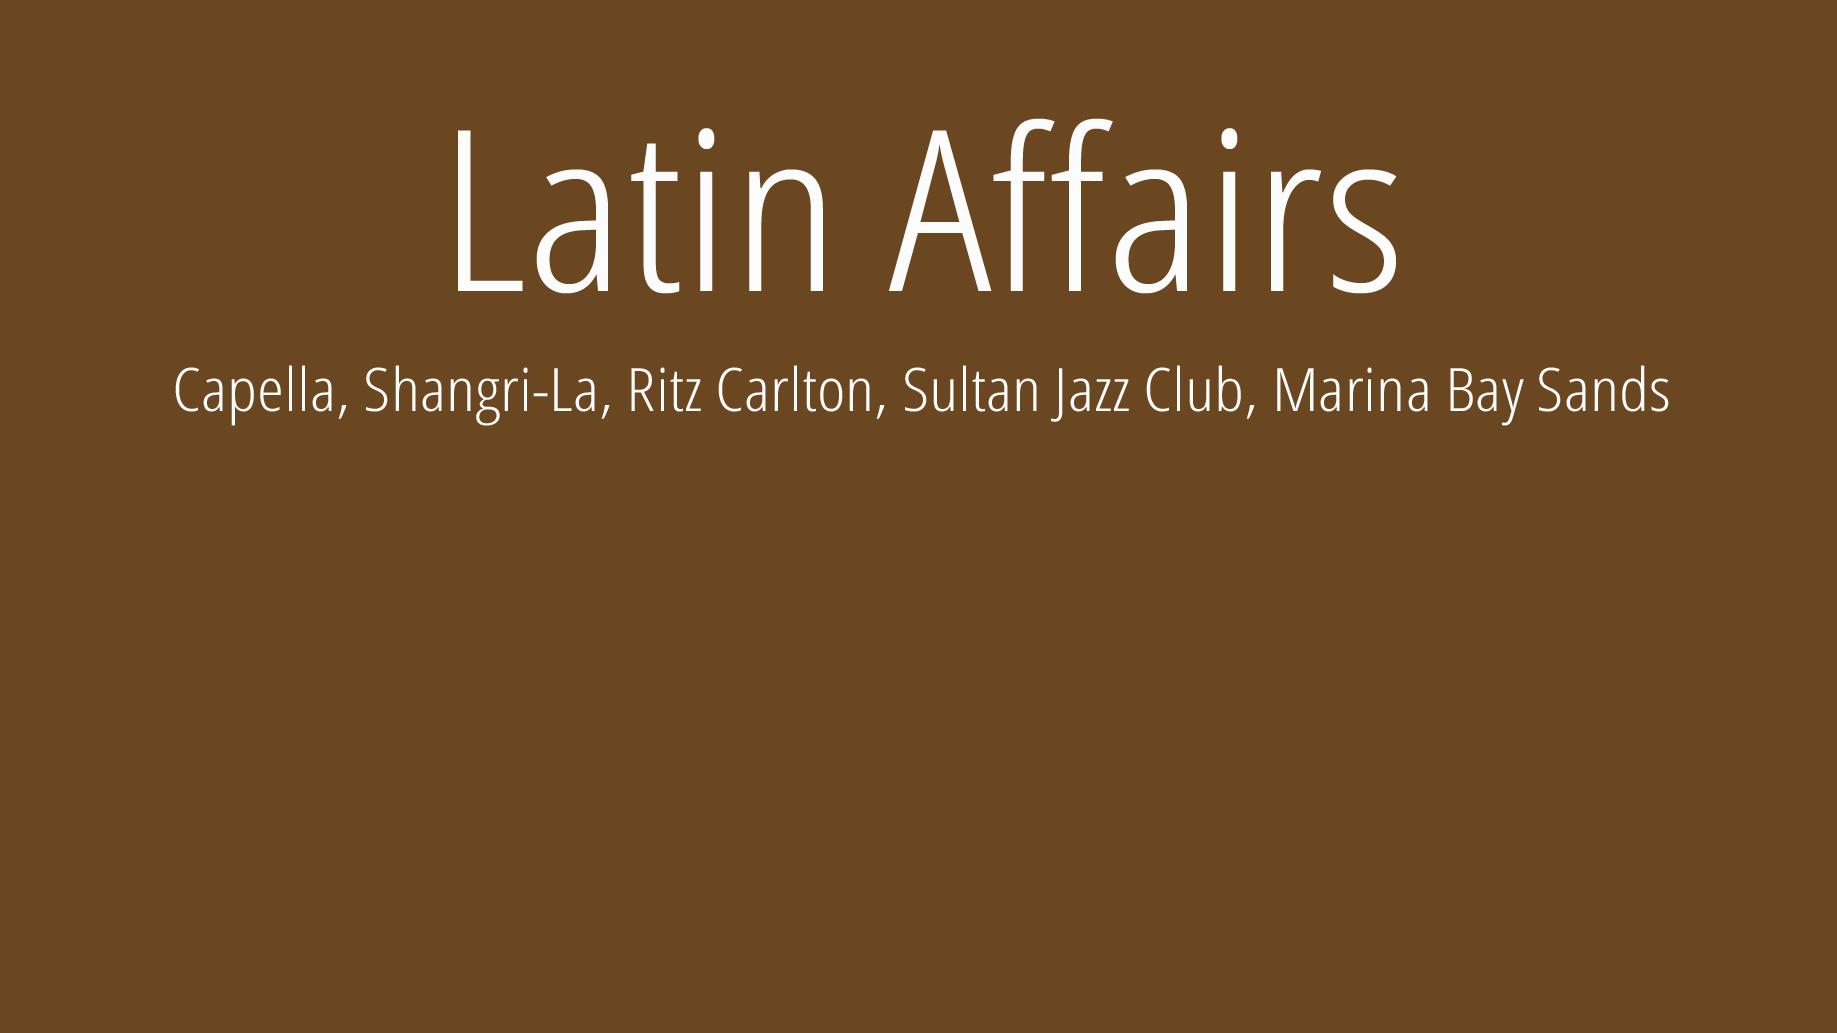 Latin Affairs